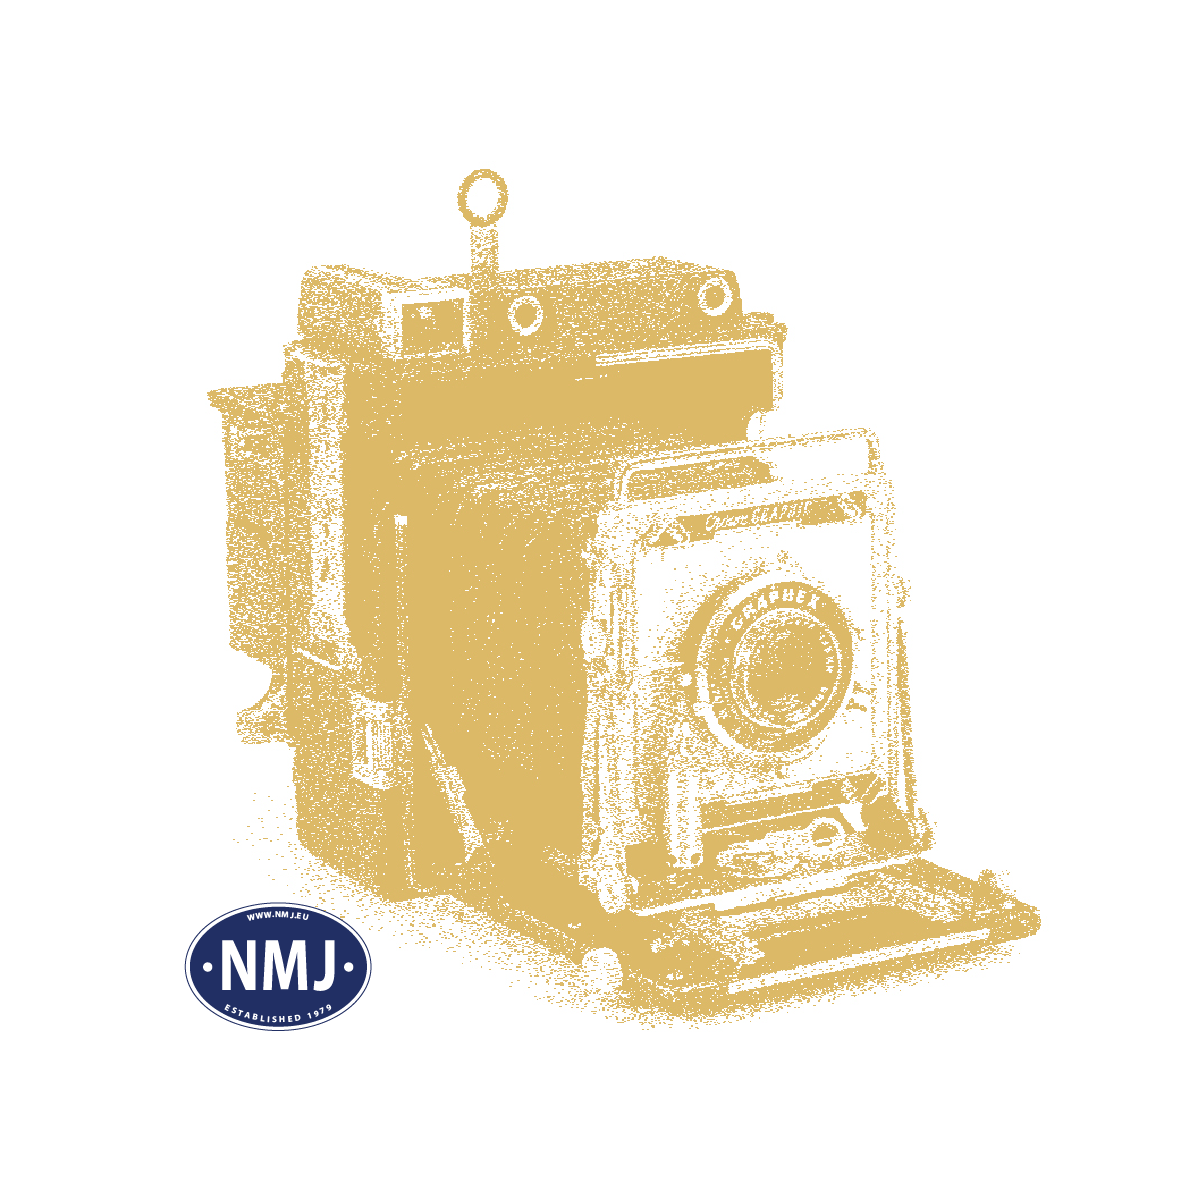 NMJT80.201AC - NMJ Topline NSB EL17.2228, AC